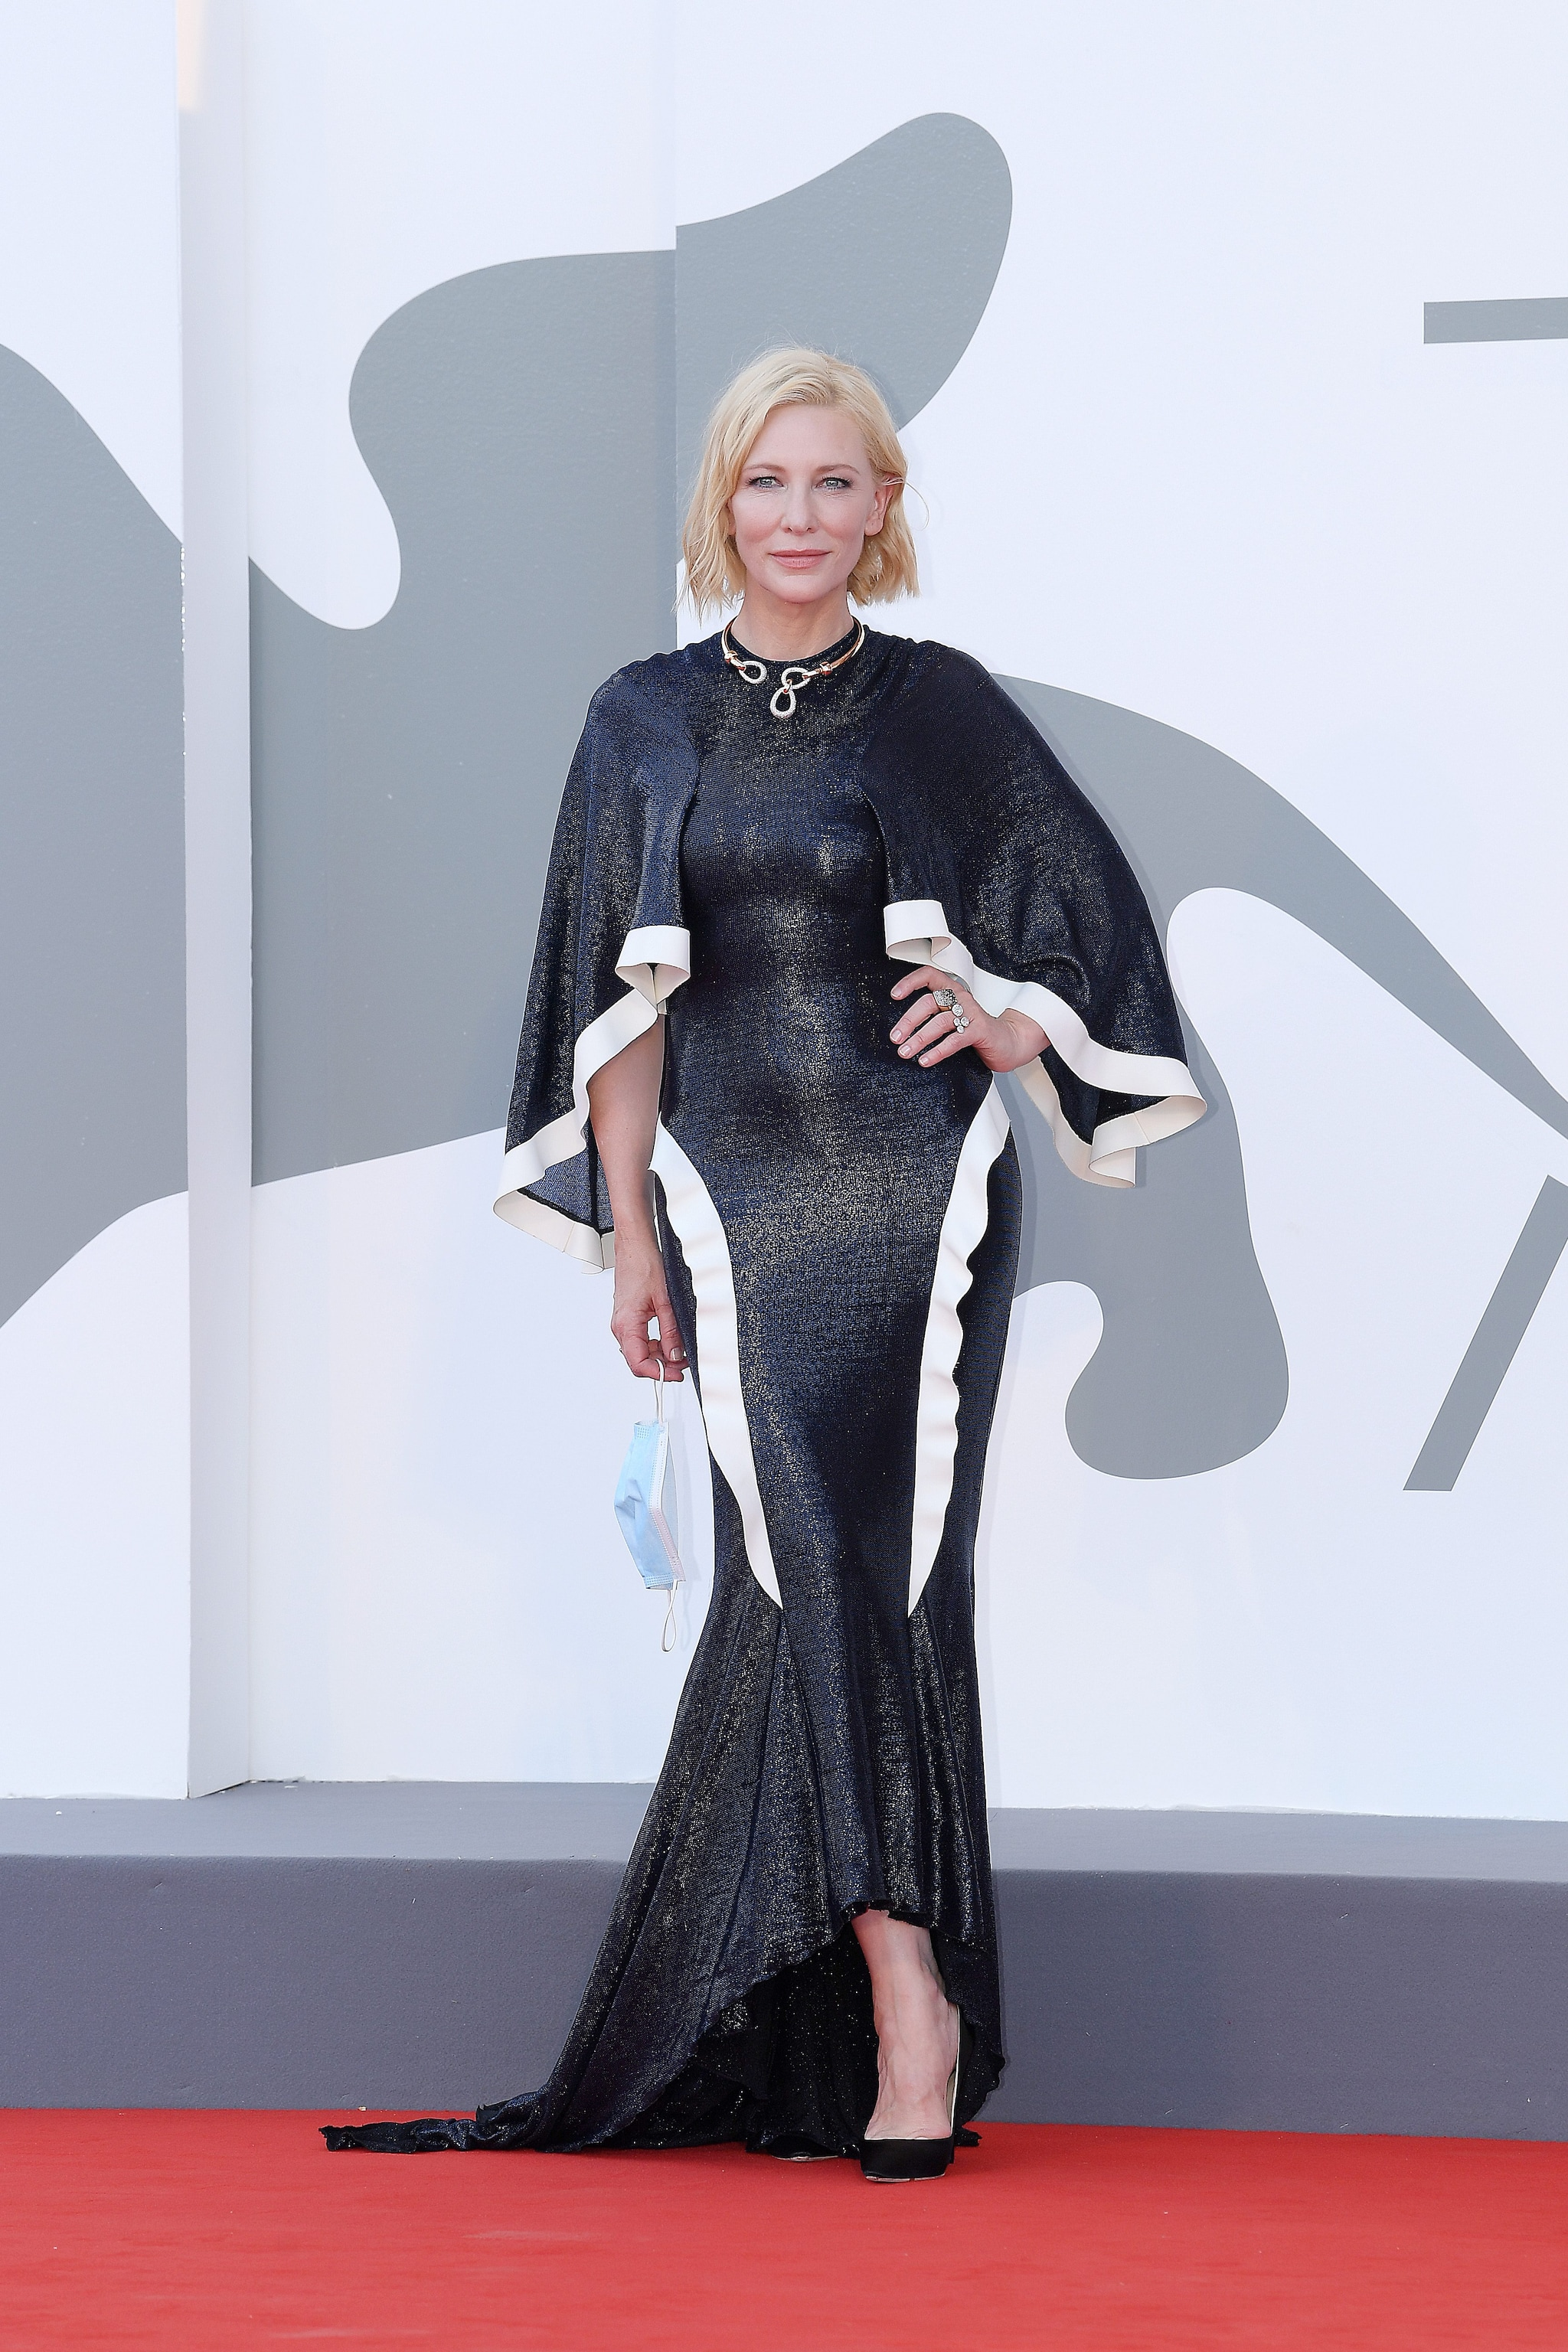 Cate Blanchett in Esteban Cortazar